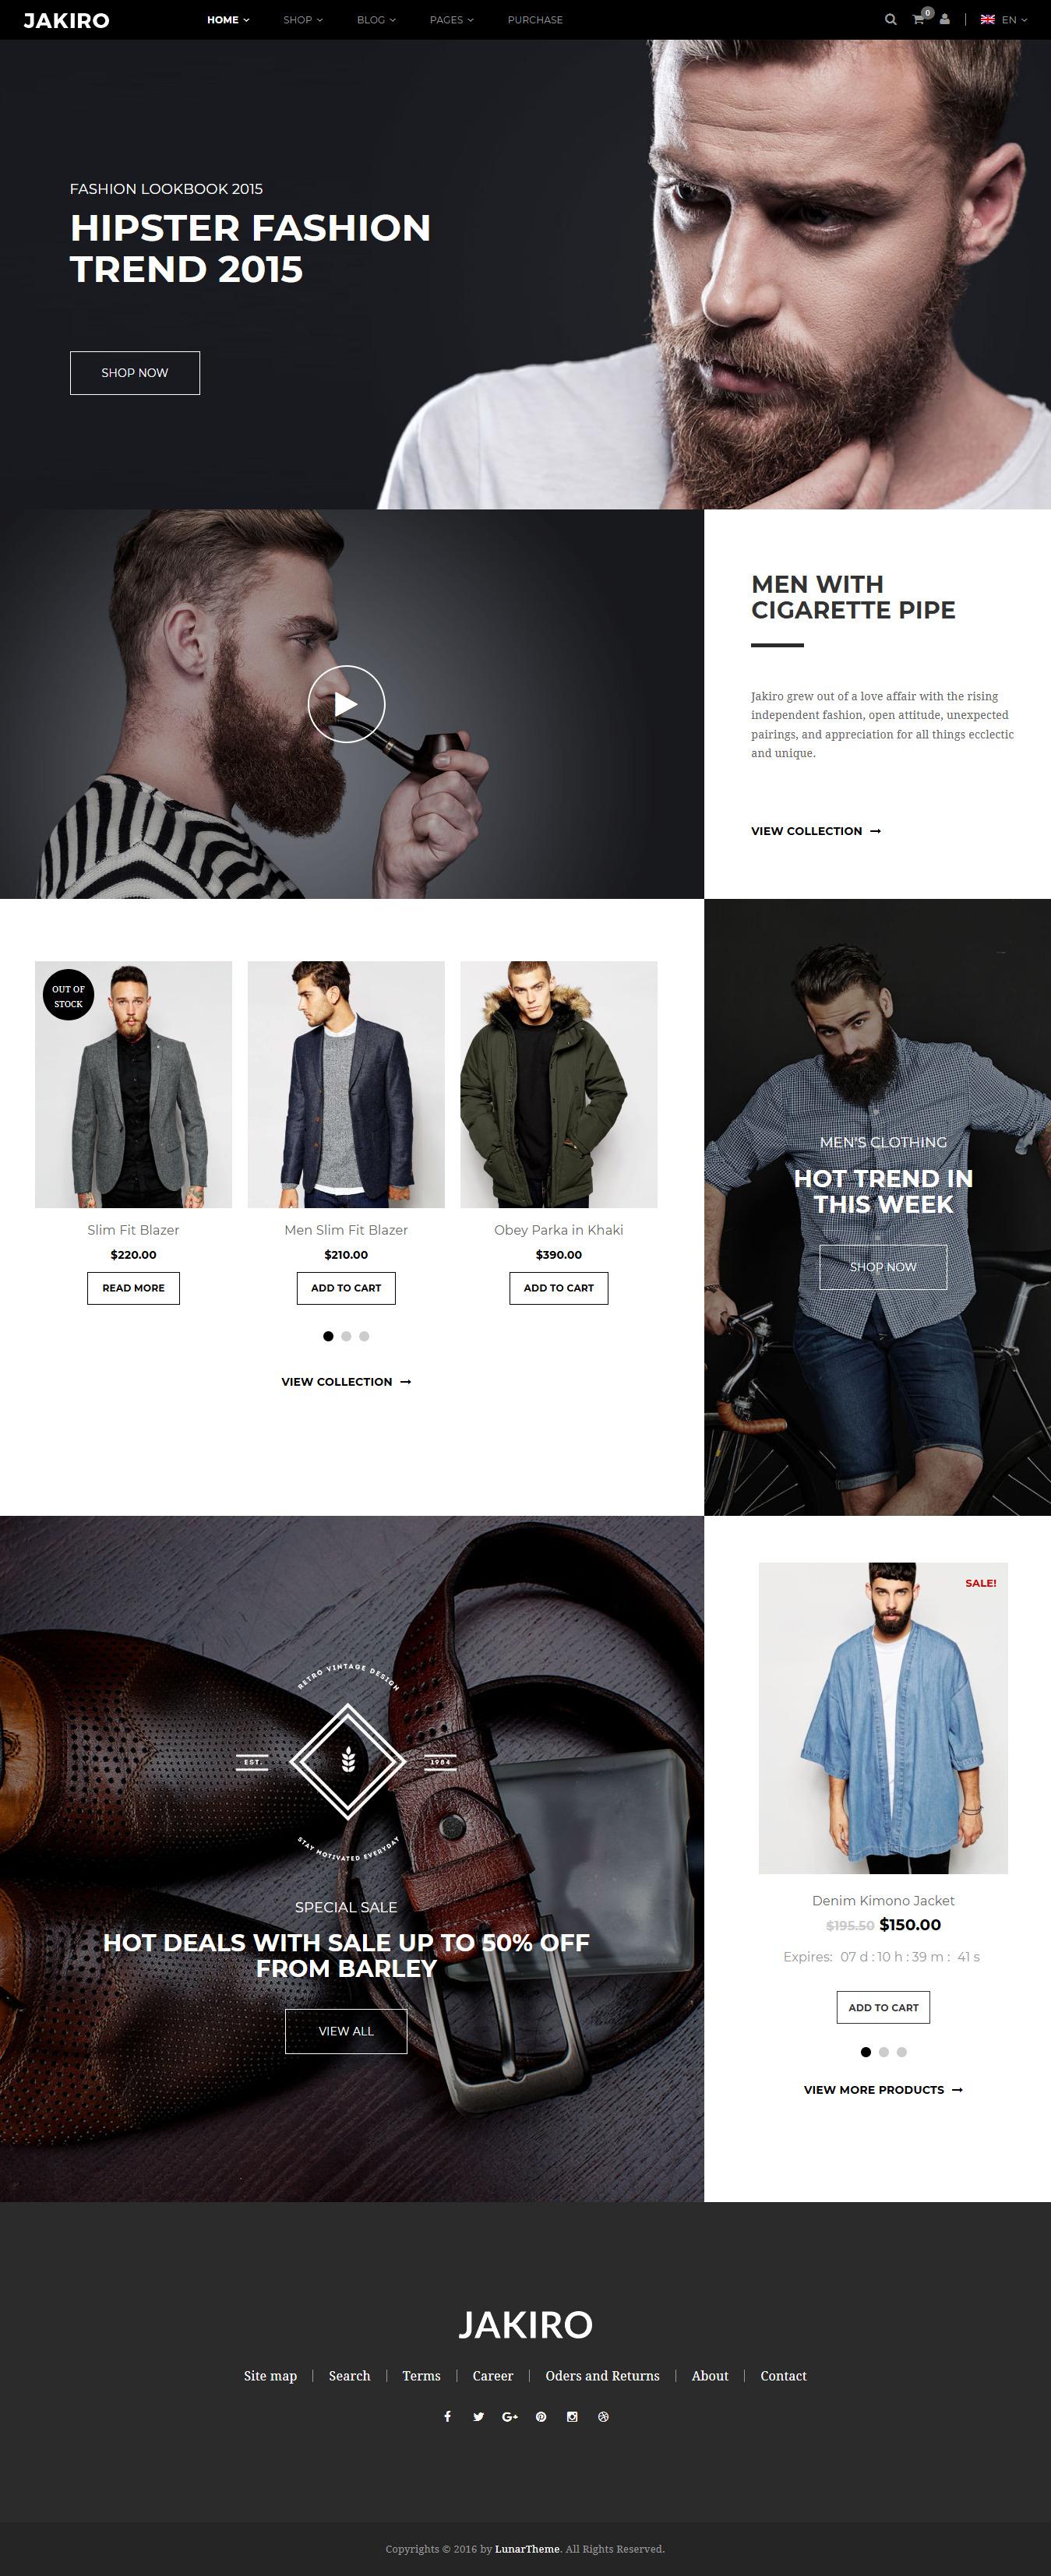 Jakiro - Best Premium Fashion WordPress Themes